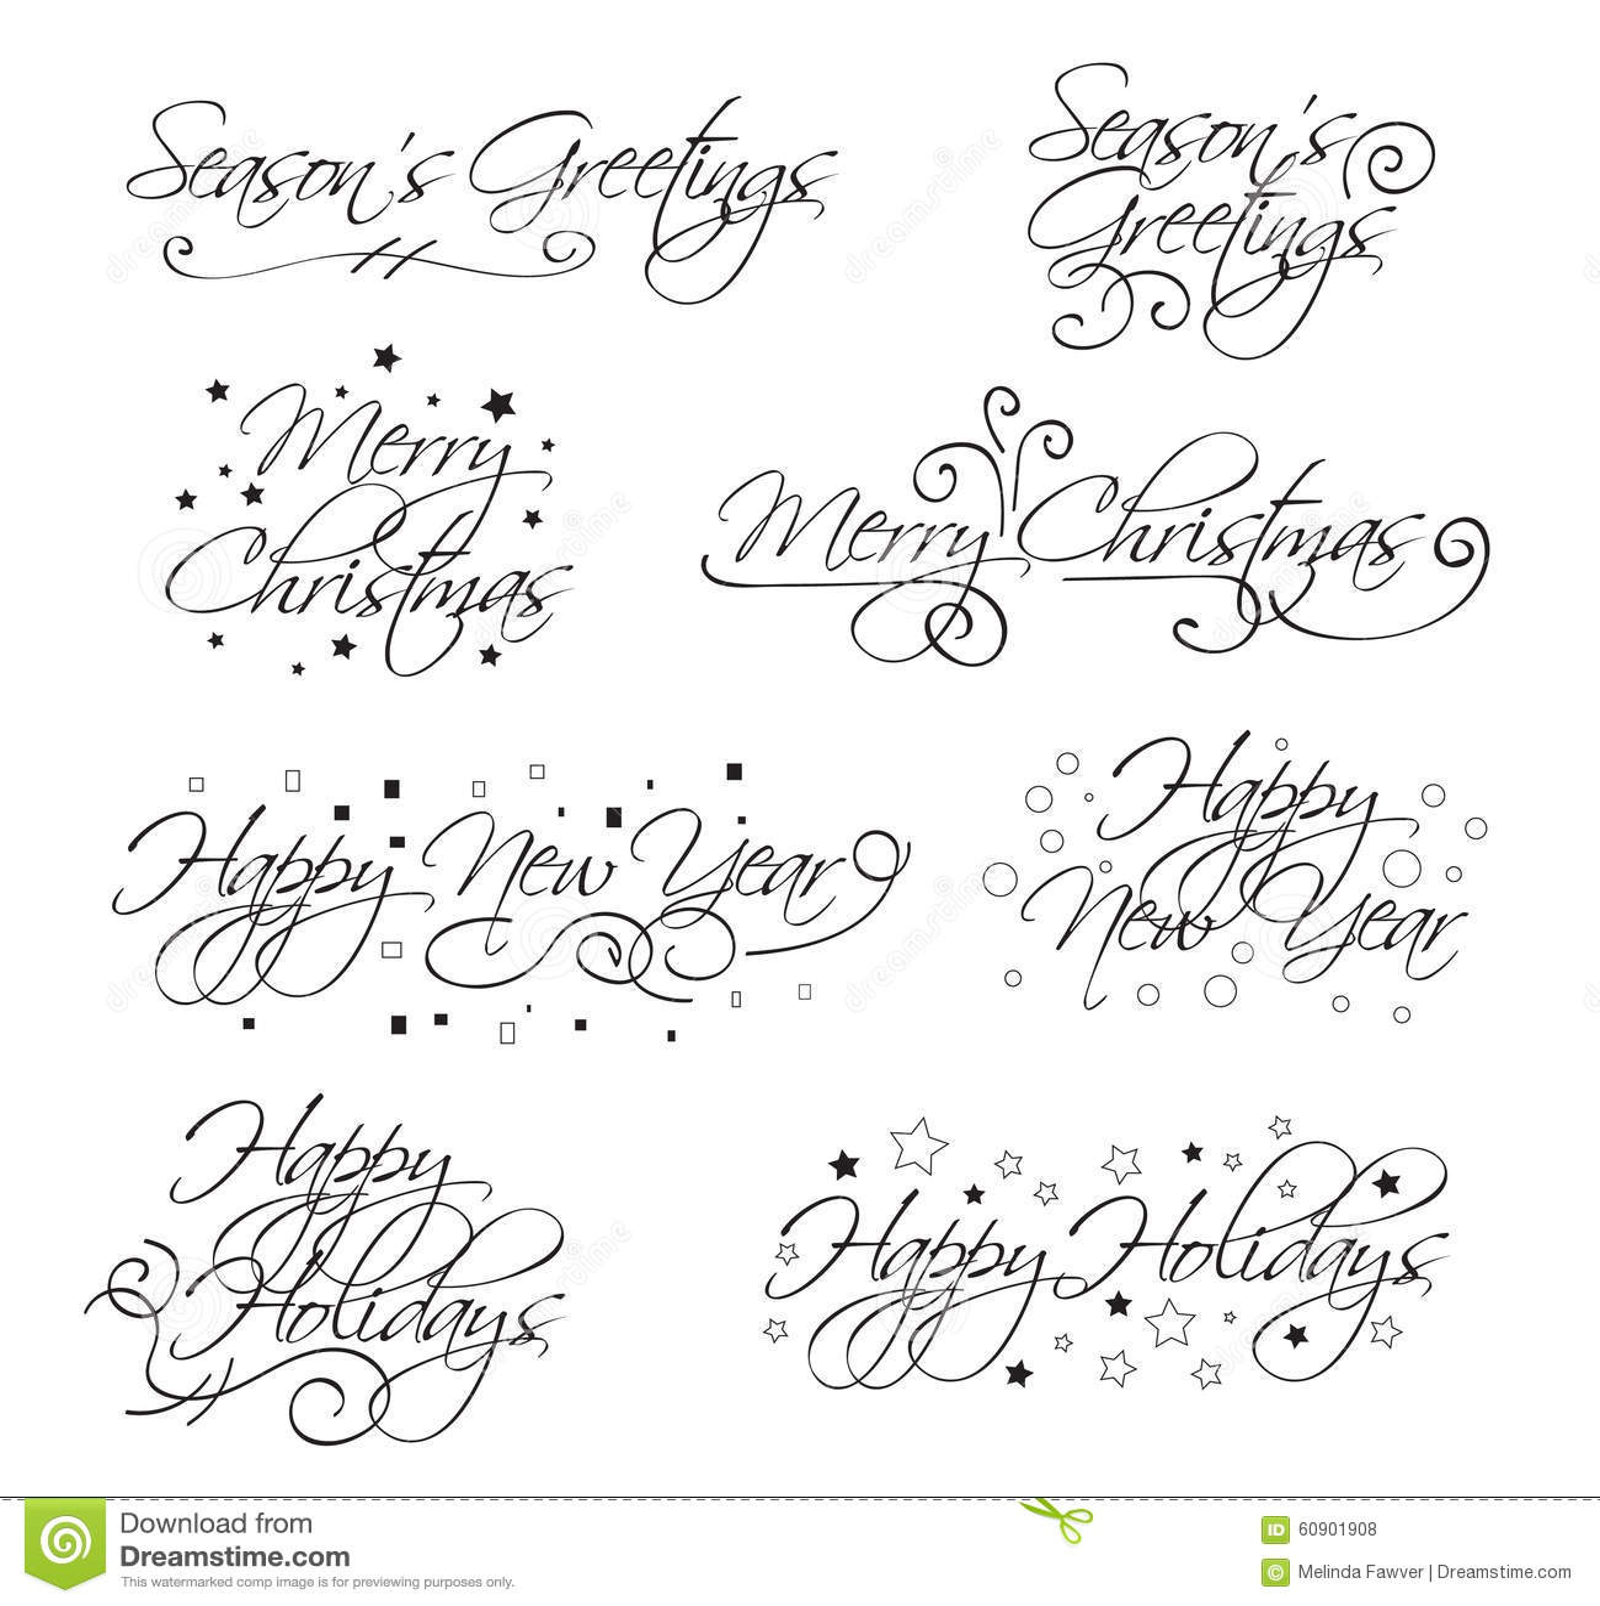 Holiday vector text stock vector illustration of calligraphic download holiday vector text stock vector illustration of calligraphic 60901908 m4hsunfo